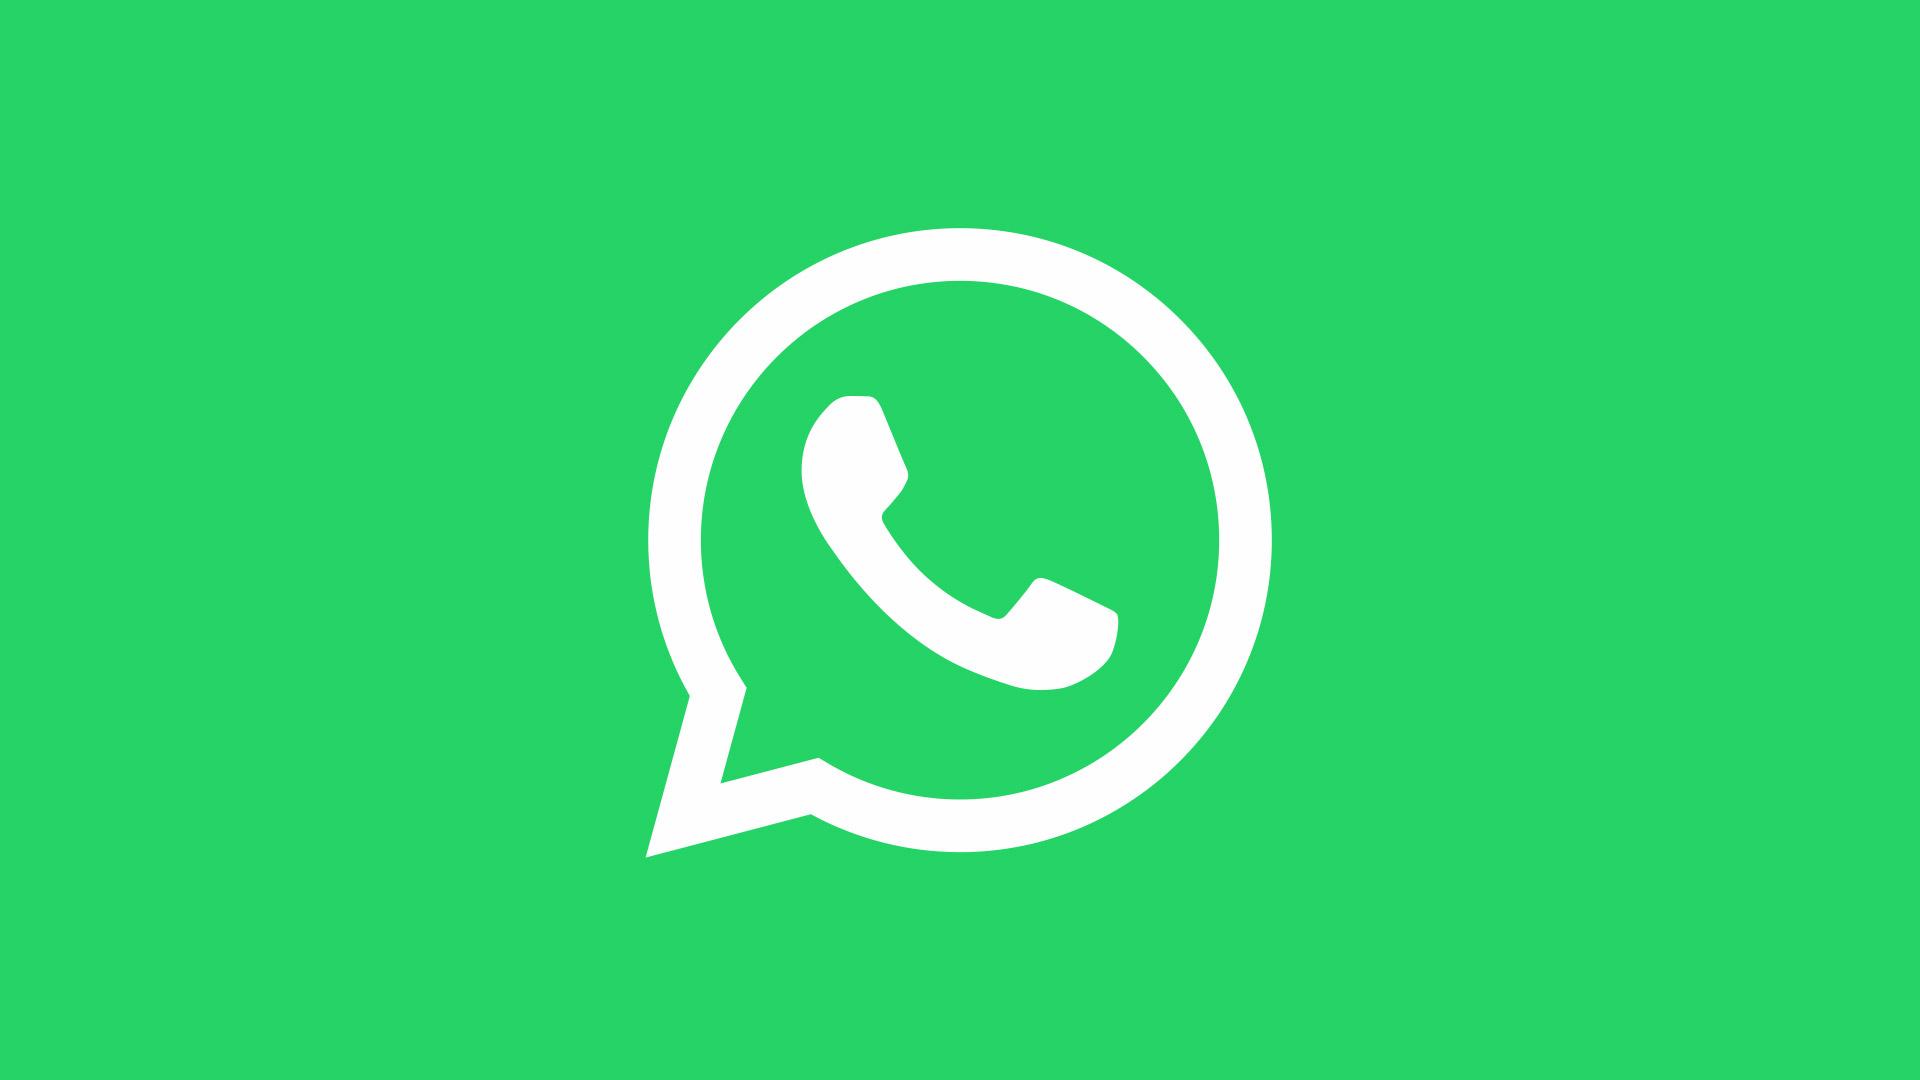 How to use WhatsApp | TechRadar